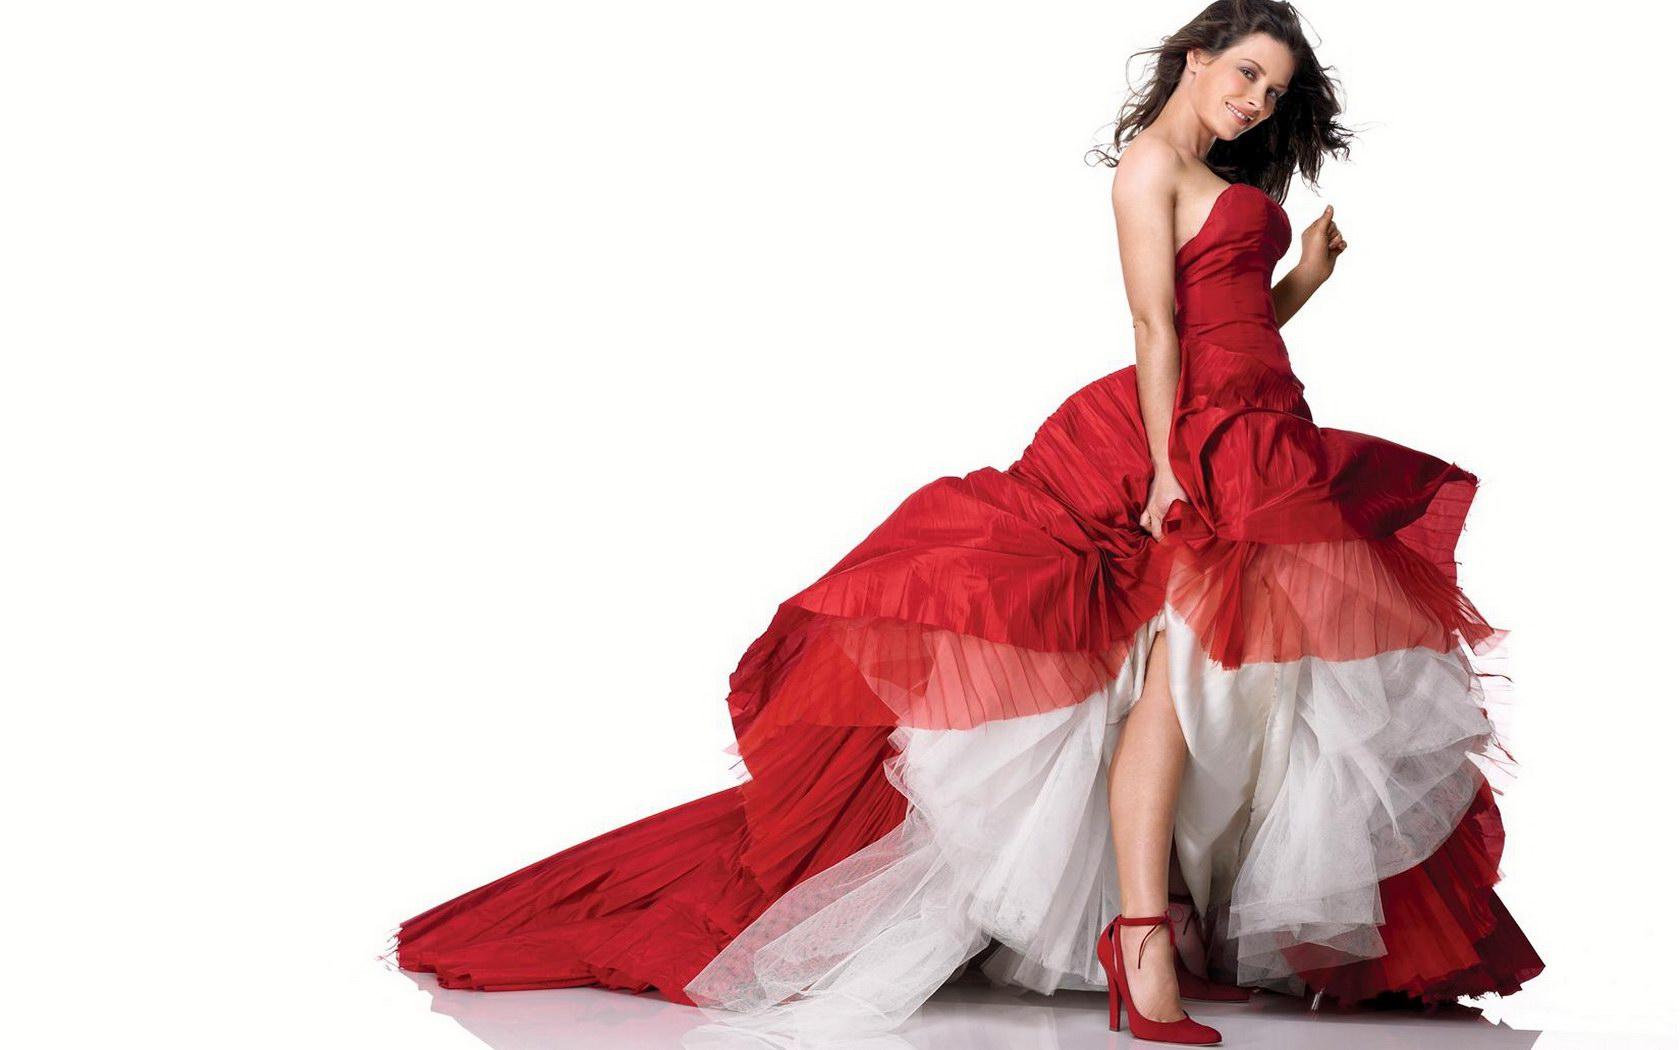 Evangeline Lilly en vestido rojo - 1680x1050